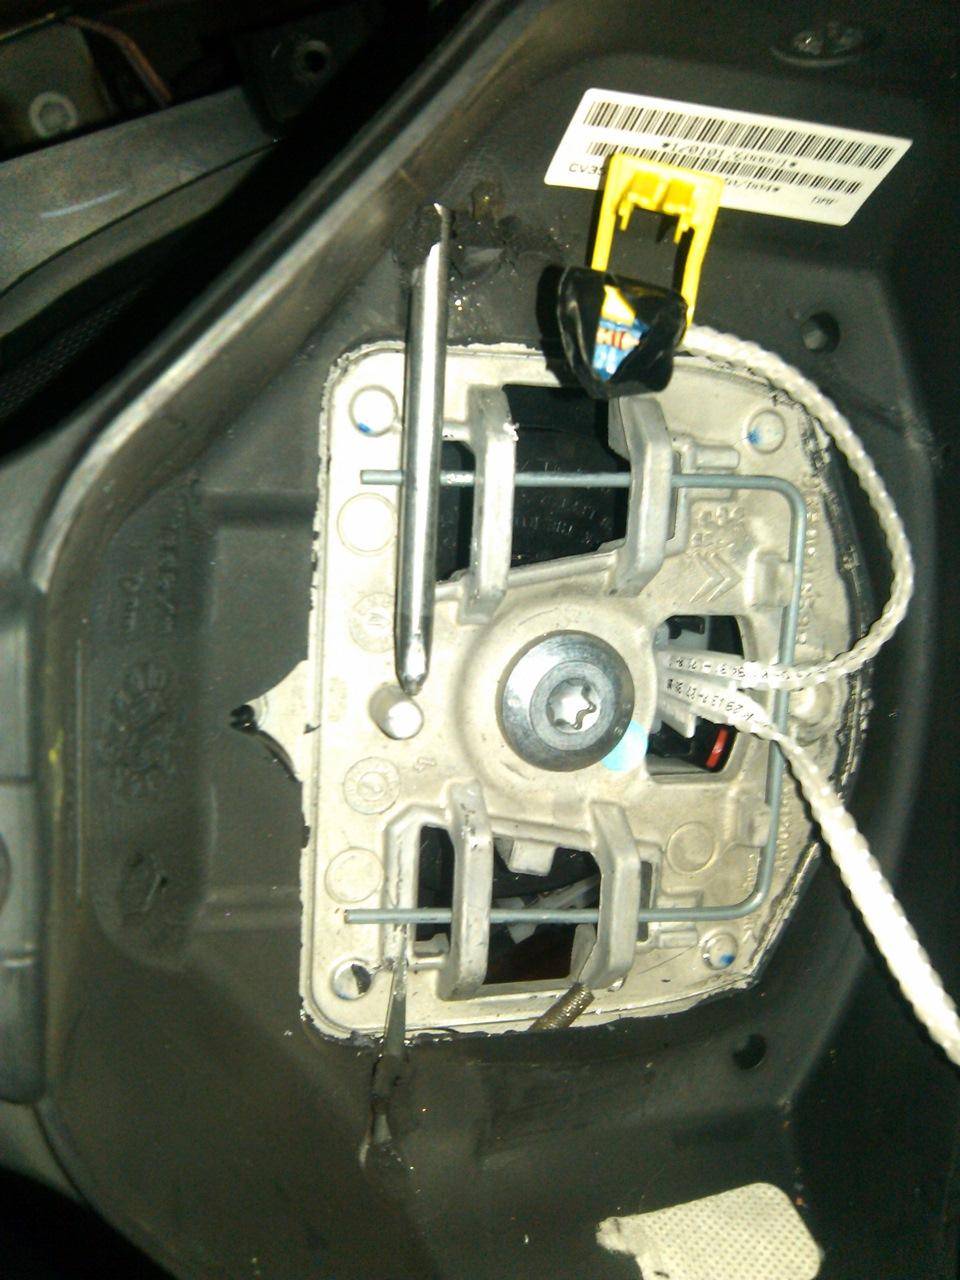 инструкция по панели308 пеже